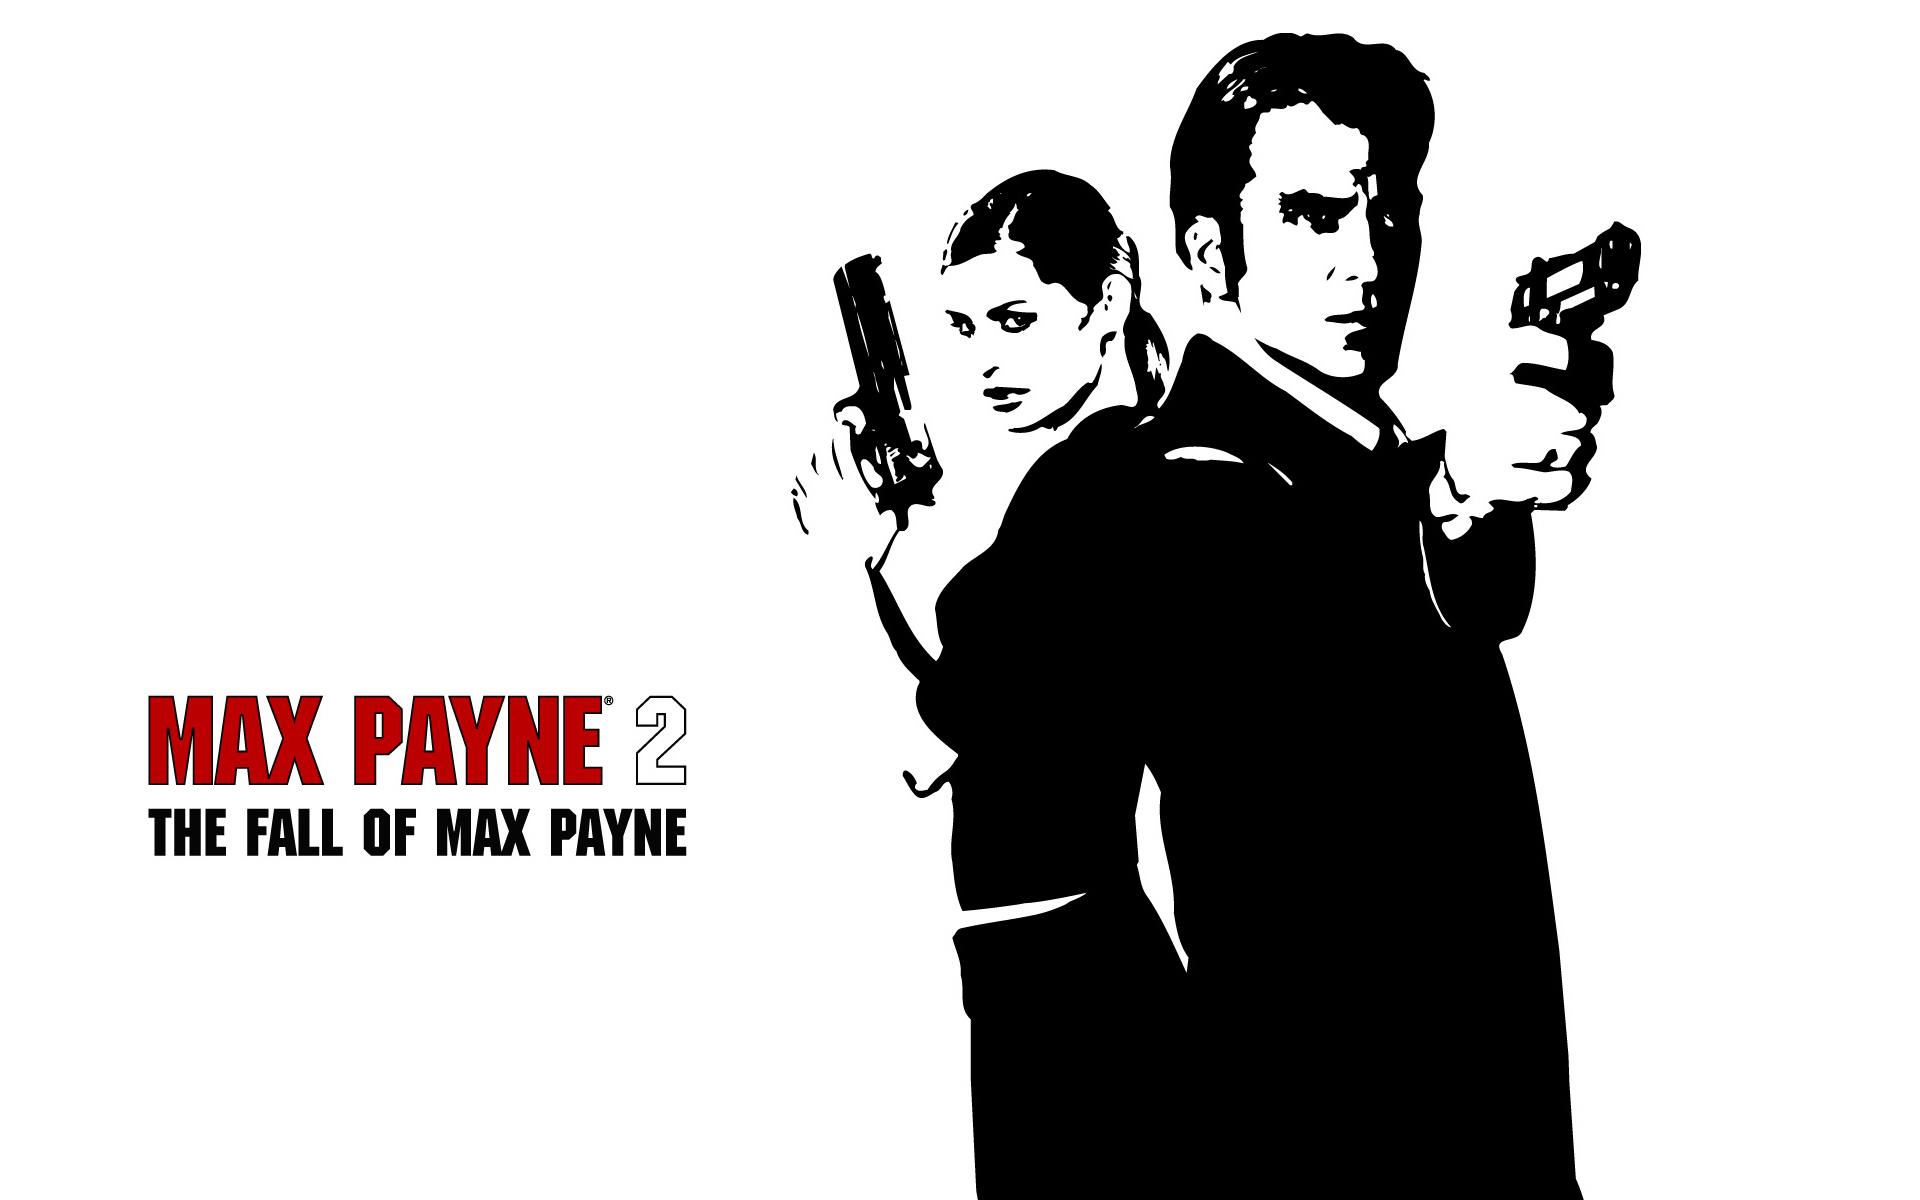 Max Payne Wallpaper Posted By John Peltier